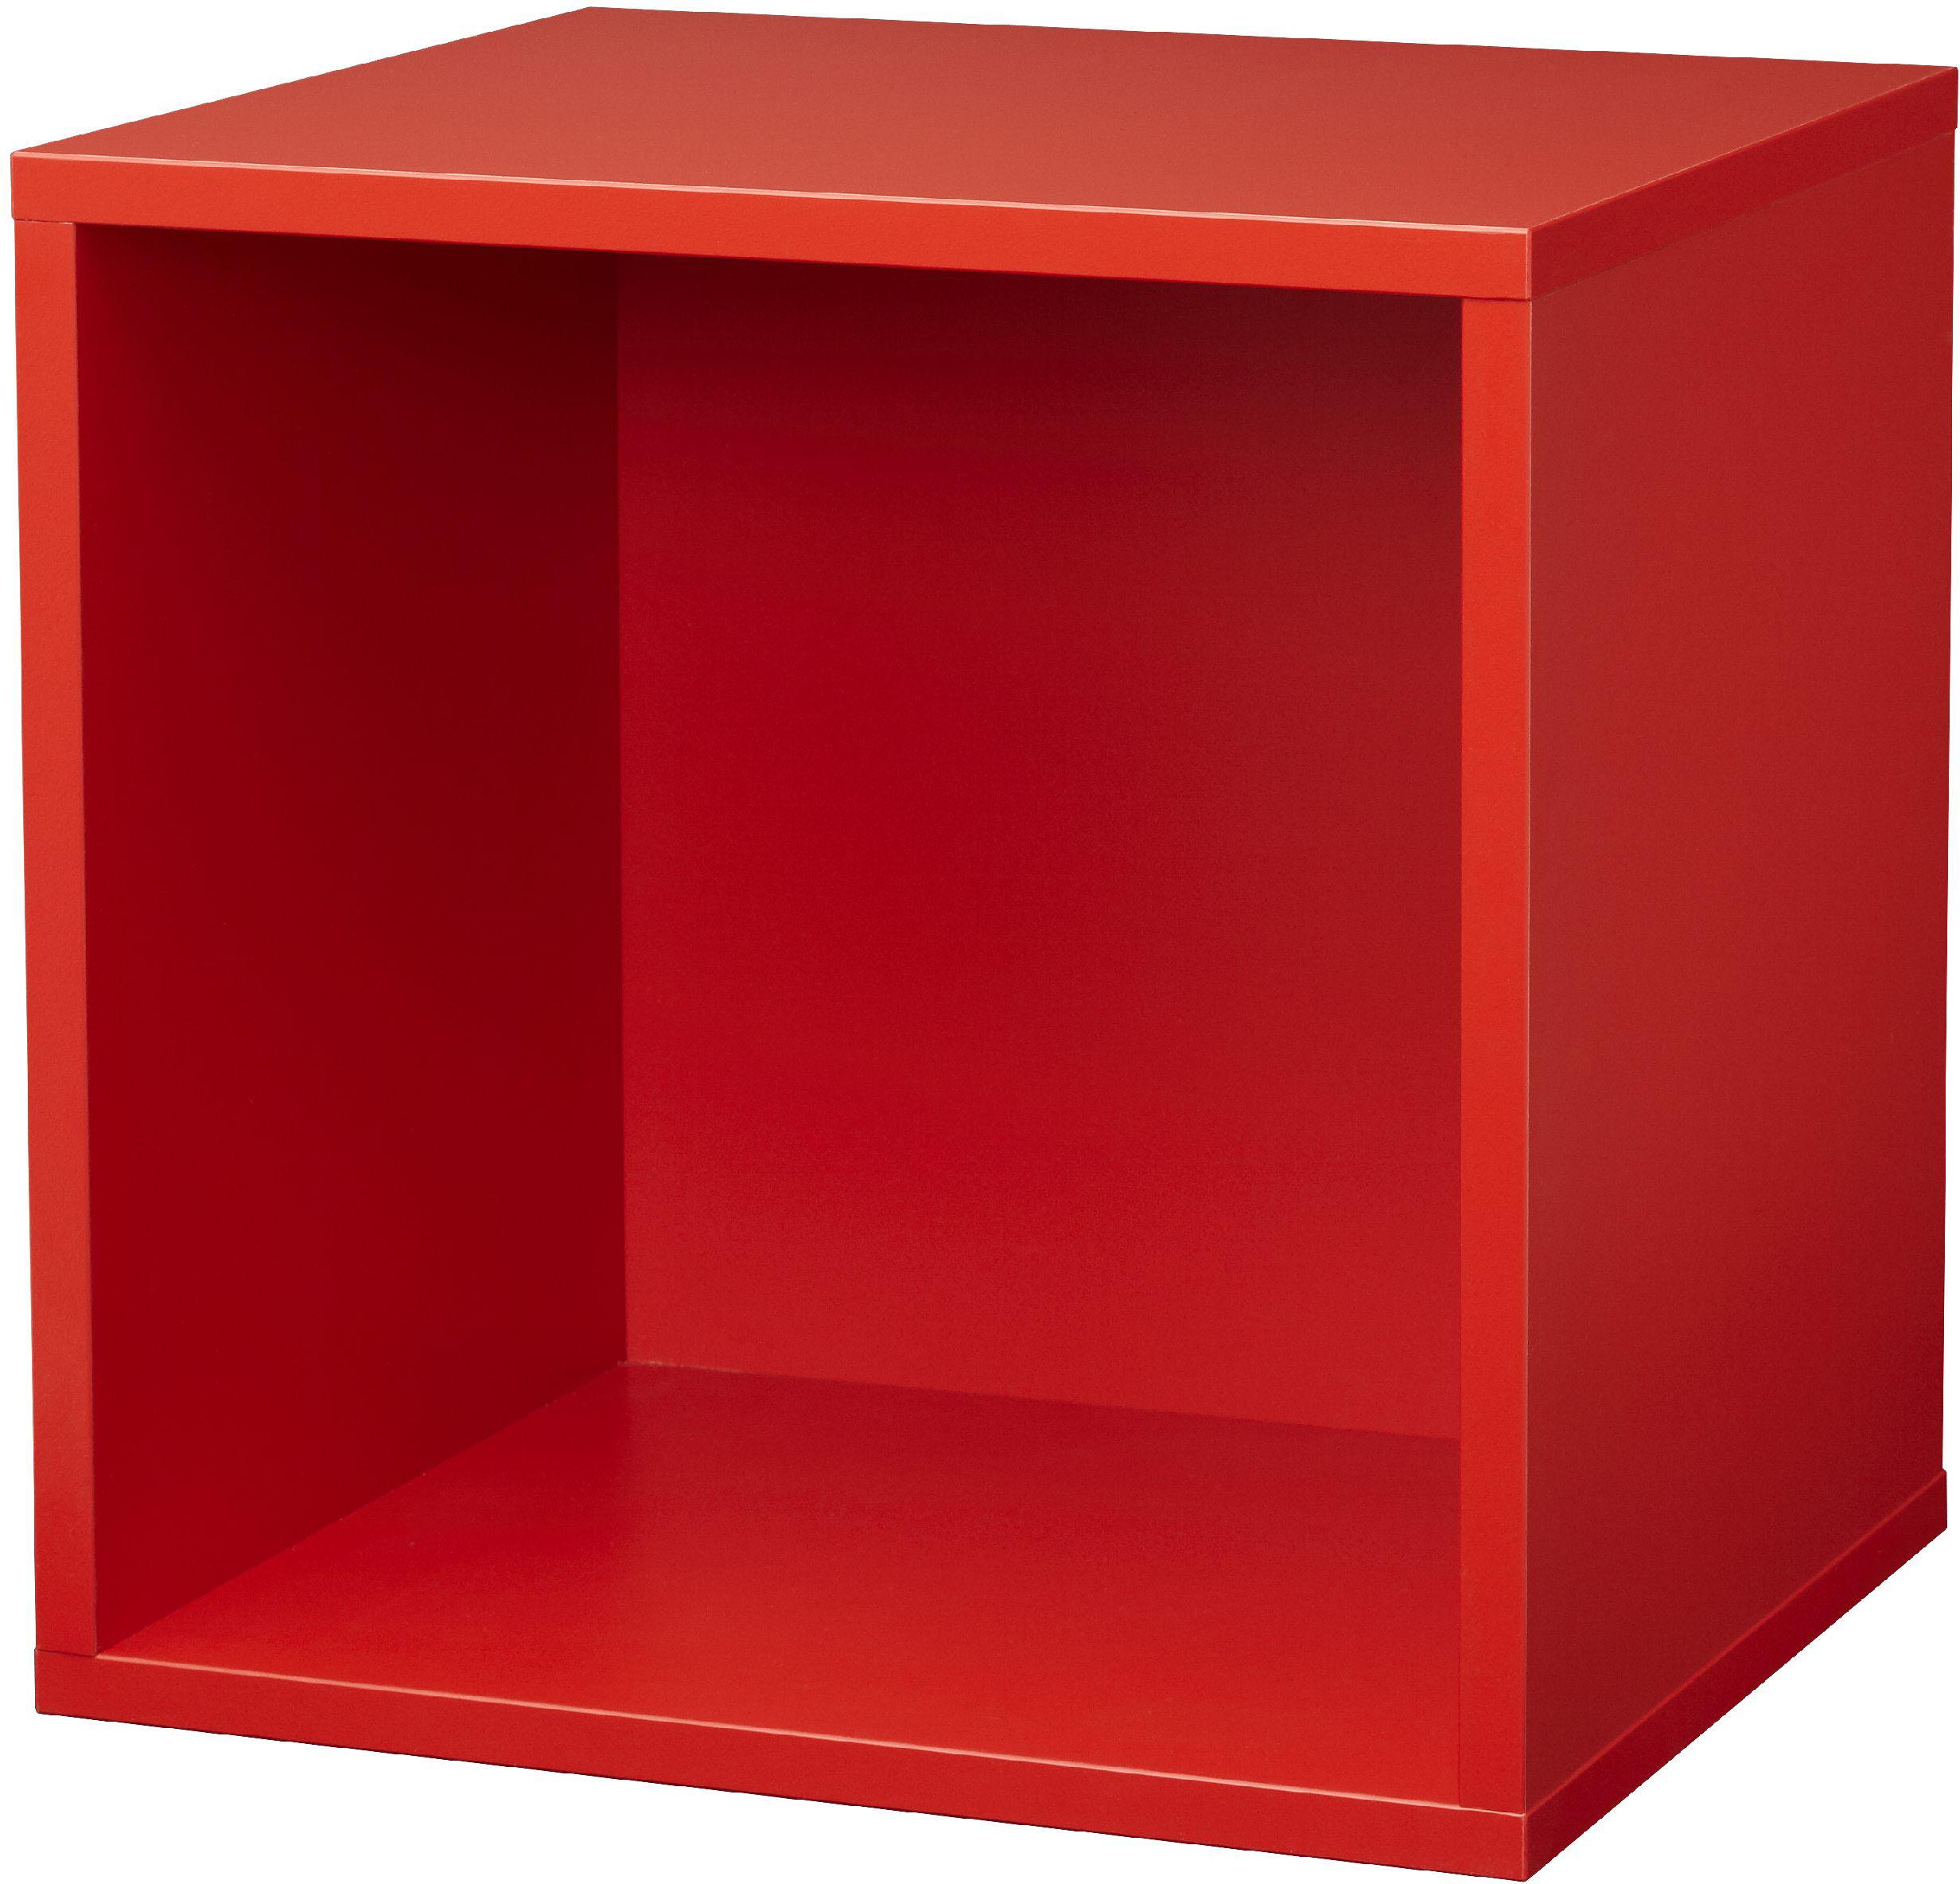 Laminated Wood Shelf Brackets Fresh Shelf Material Home